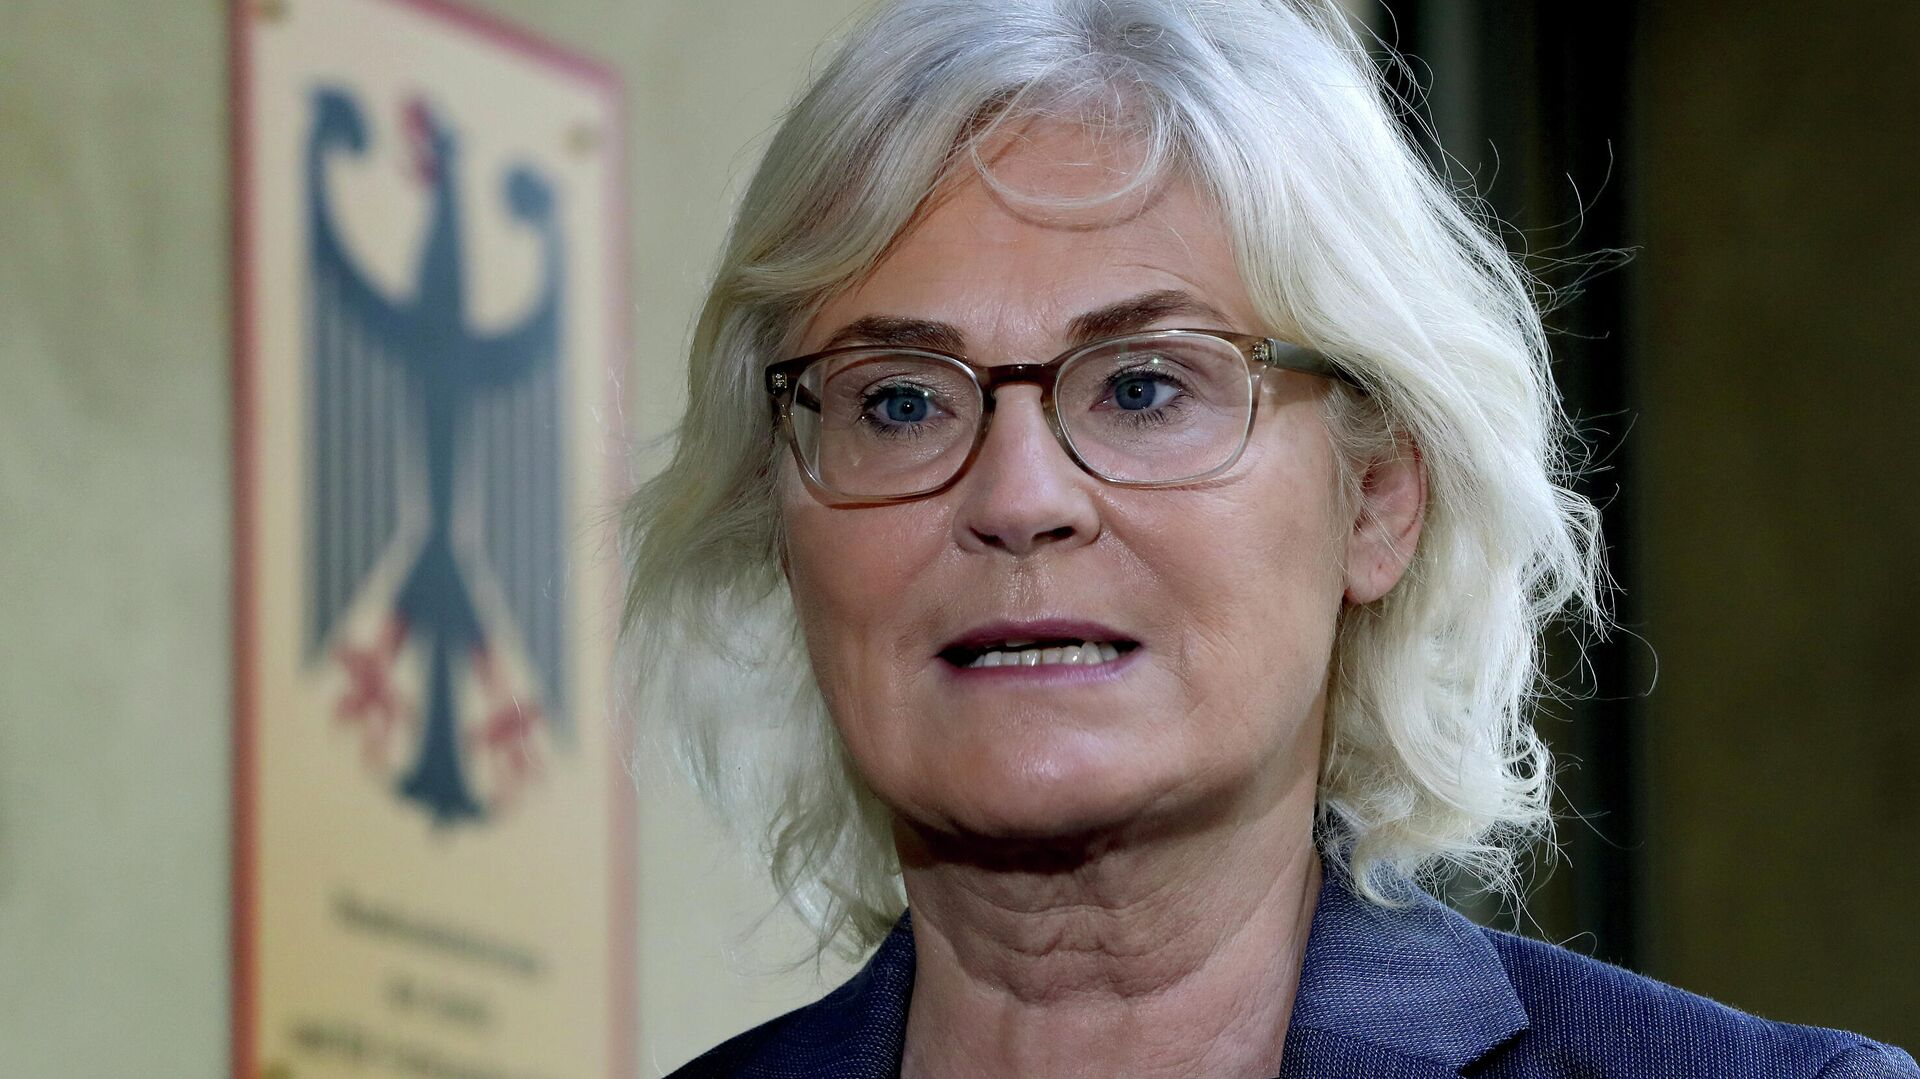 Bundesjustizministerin Christine Lambrecht (Archivfoto) - SNA, 1920, 08.10.2021